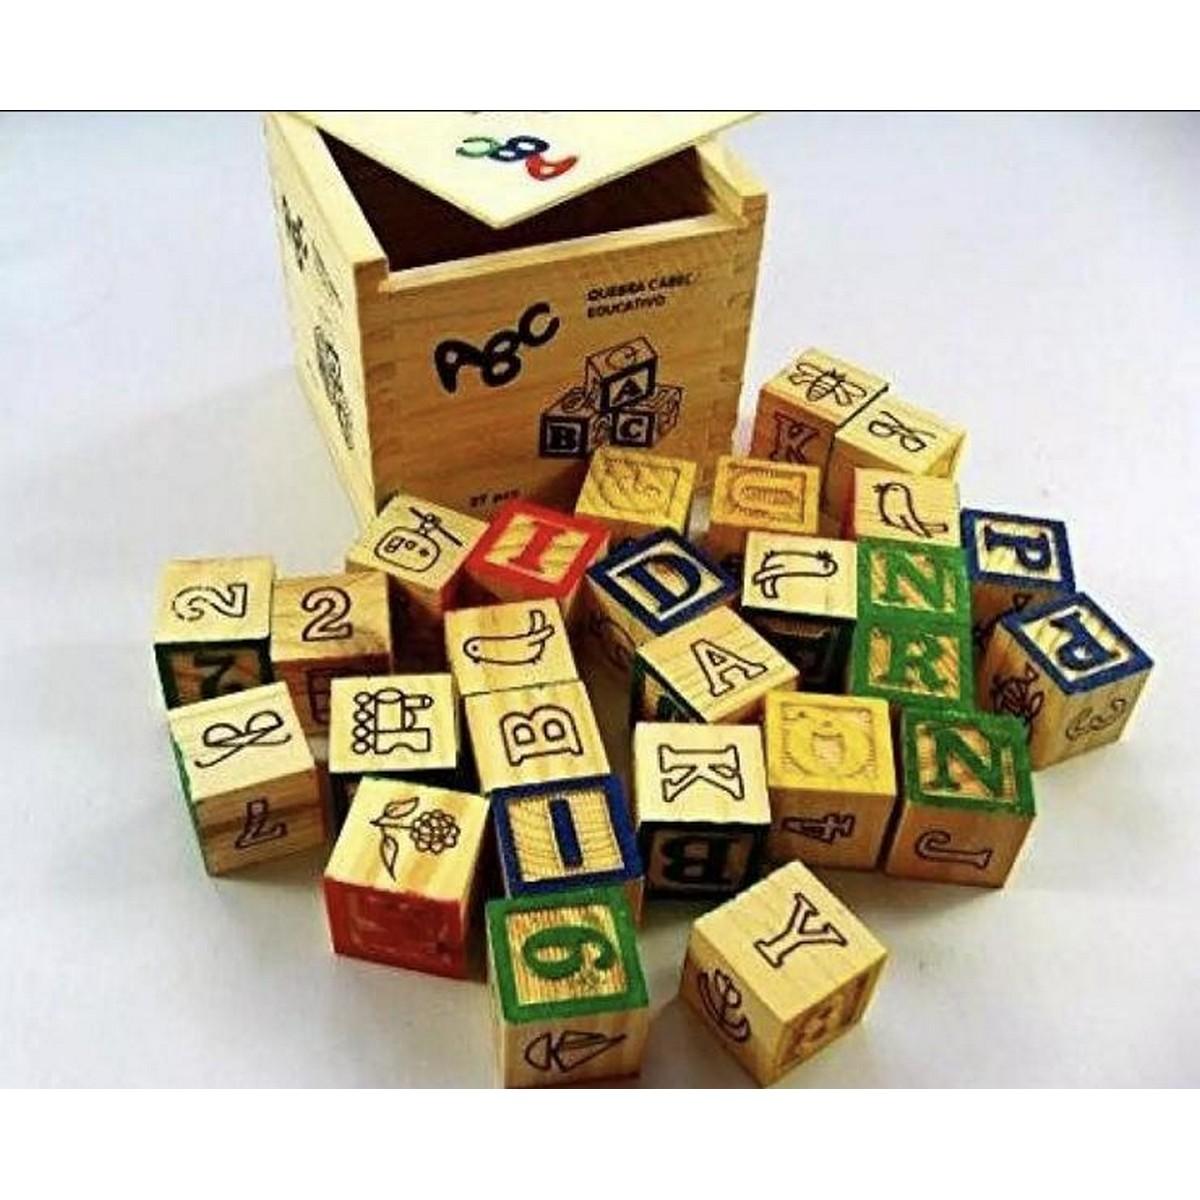 ABC Wood Blocks Box - 27 Pieces